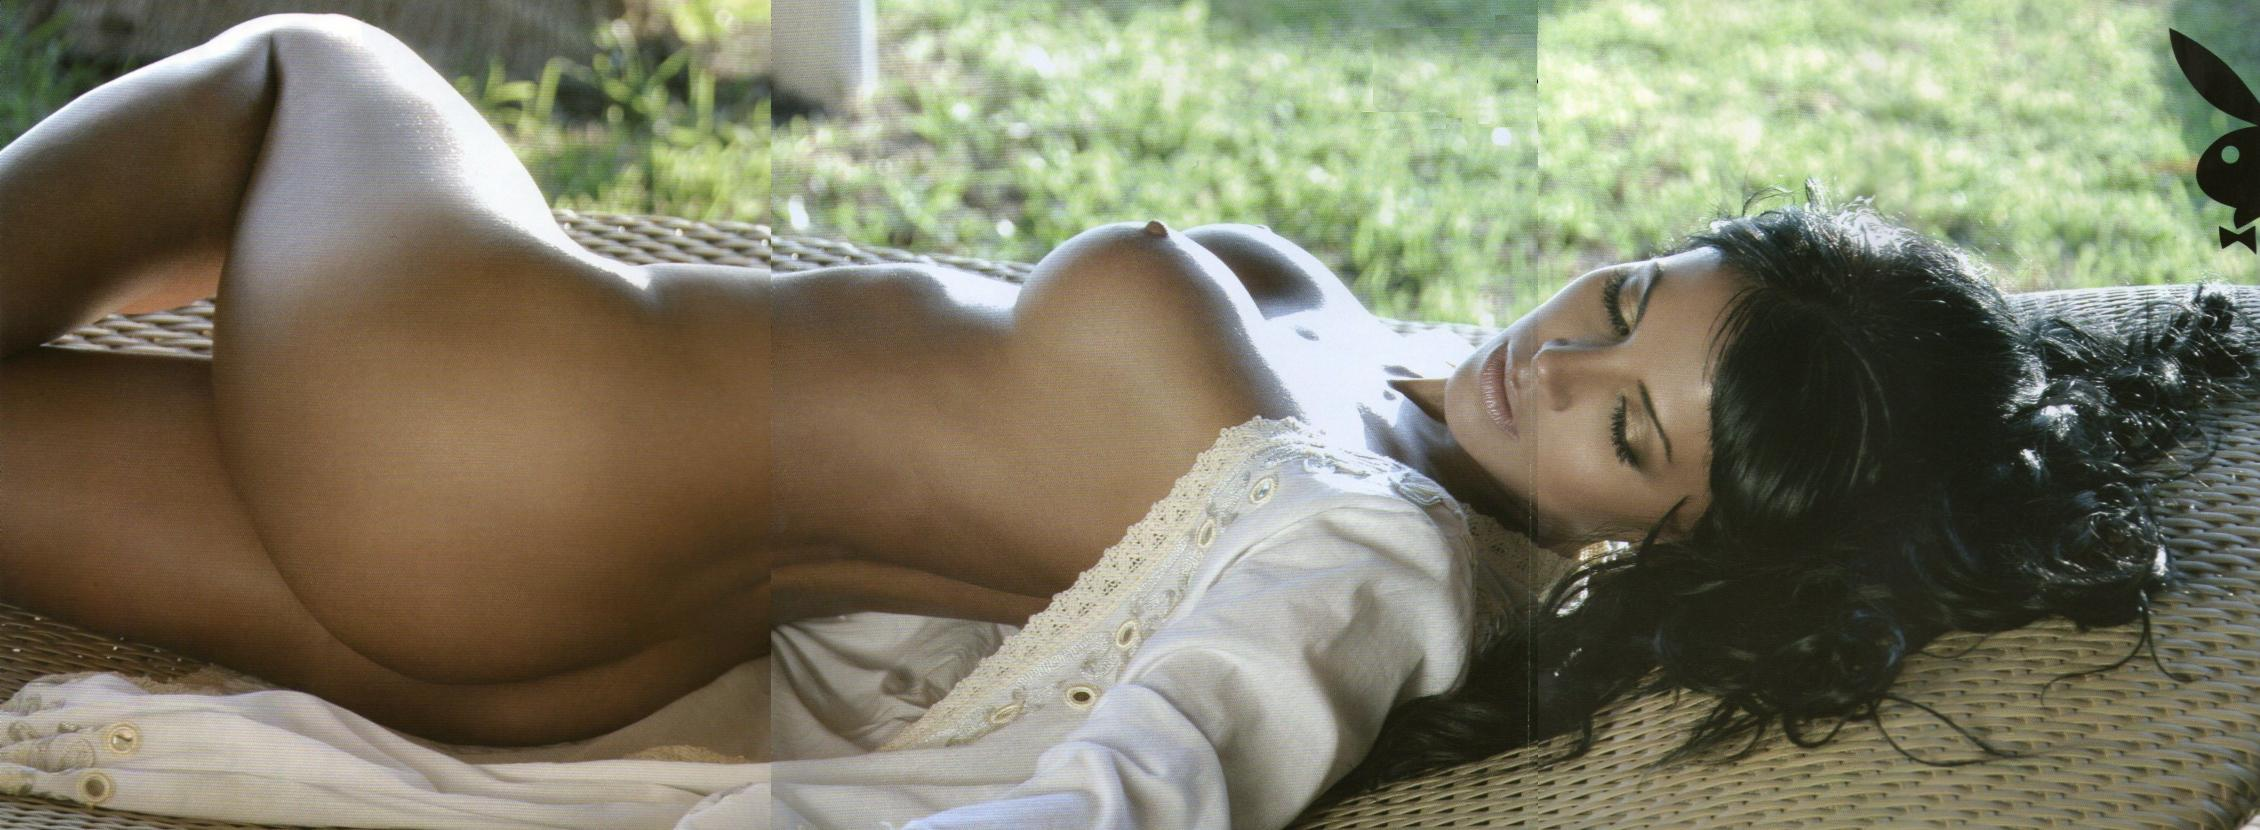 Vanessa hudson nude real